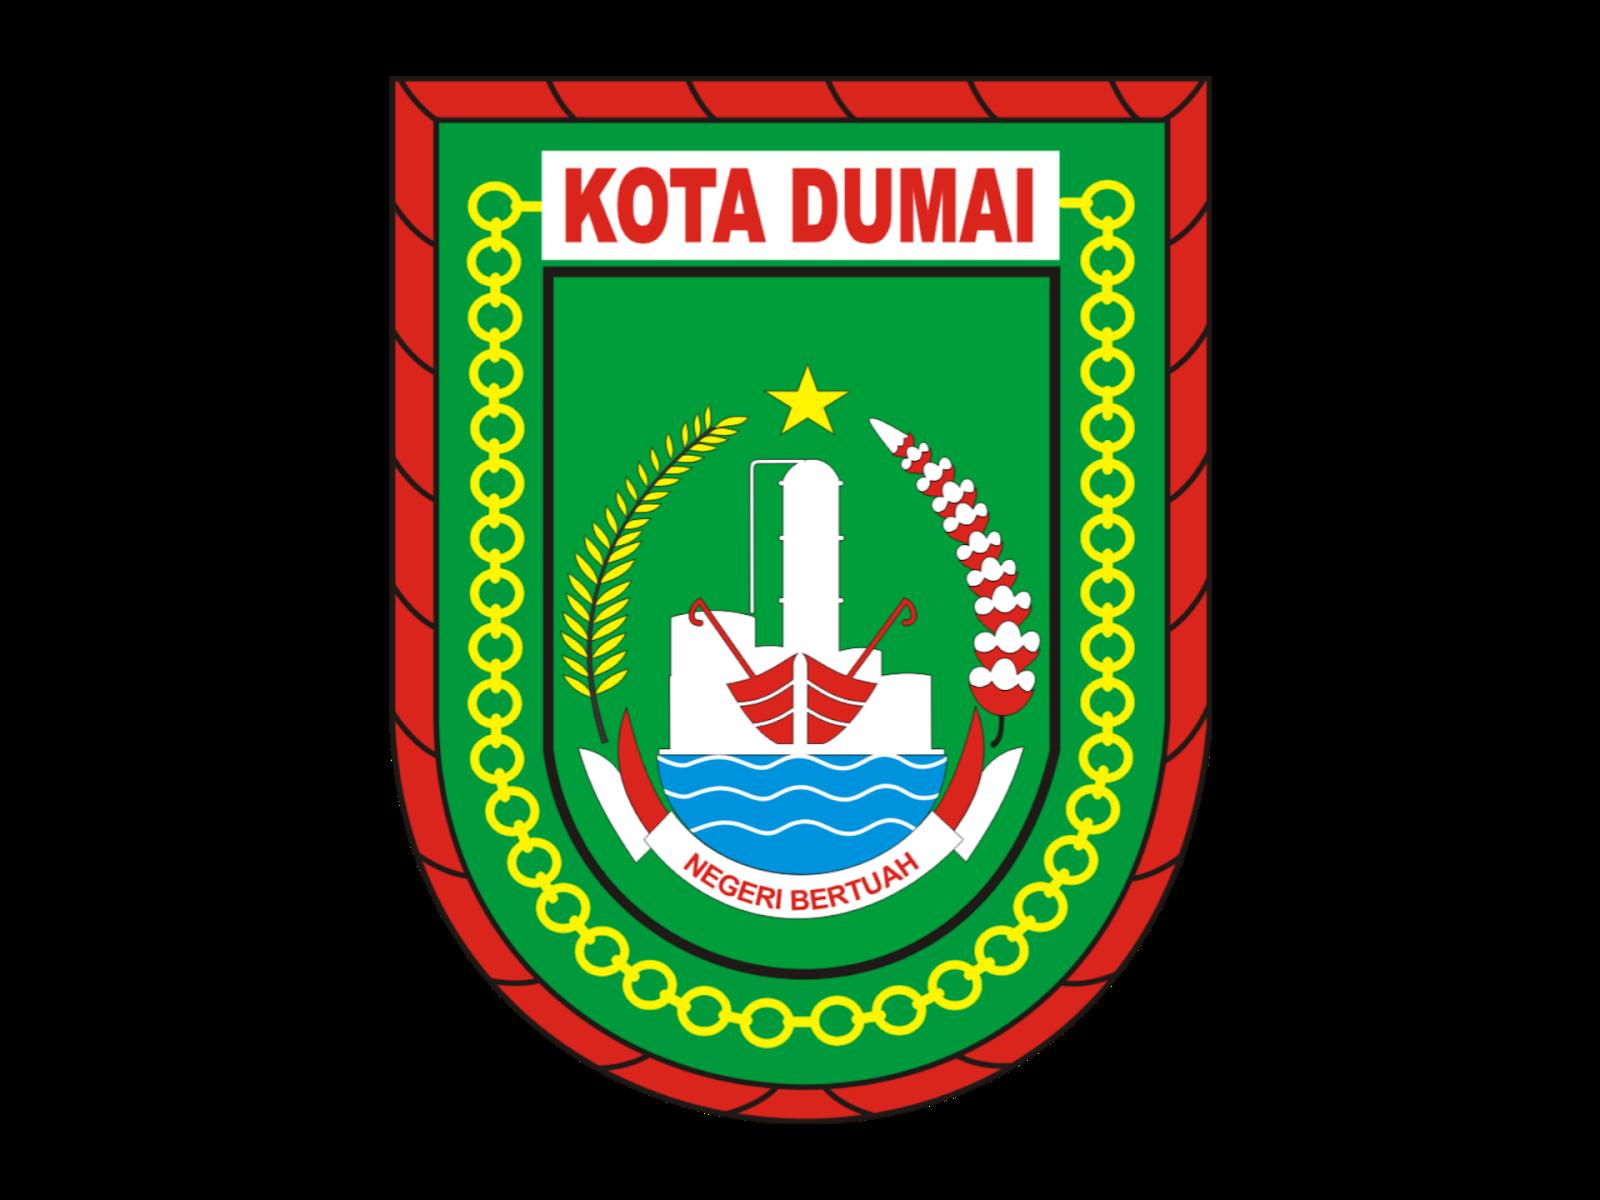 Logo Kota Dumai Format PNG